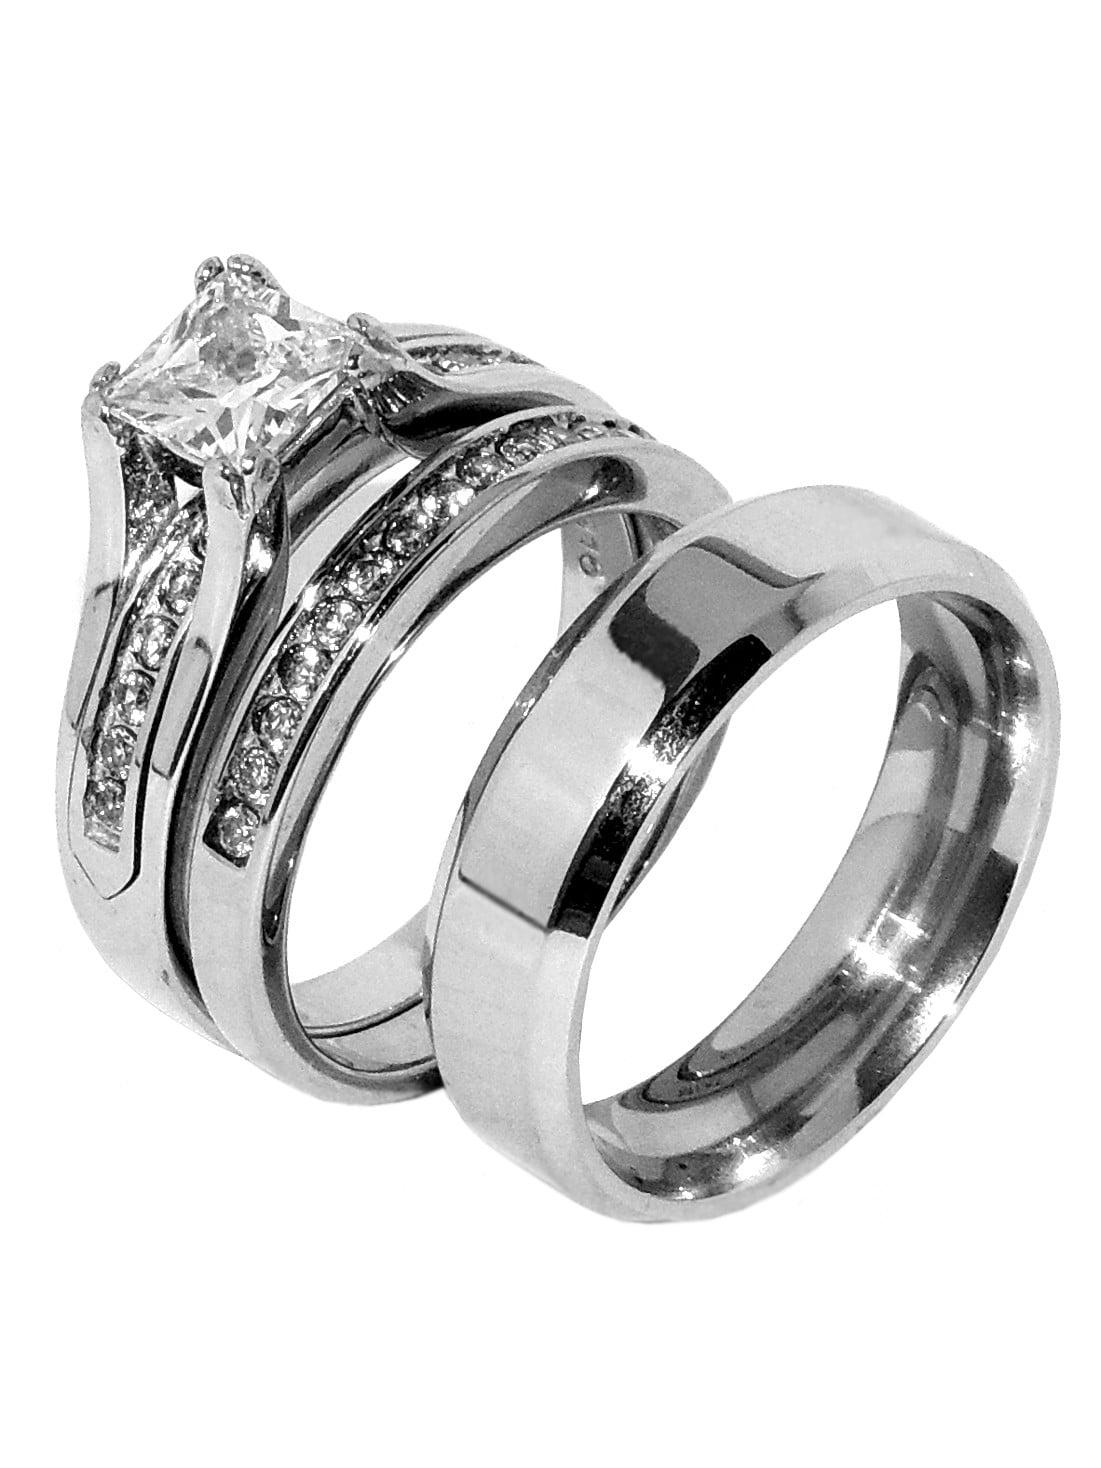 La Ny Jewelry His Hers Couple One Carat Princess Square Cz